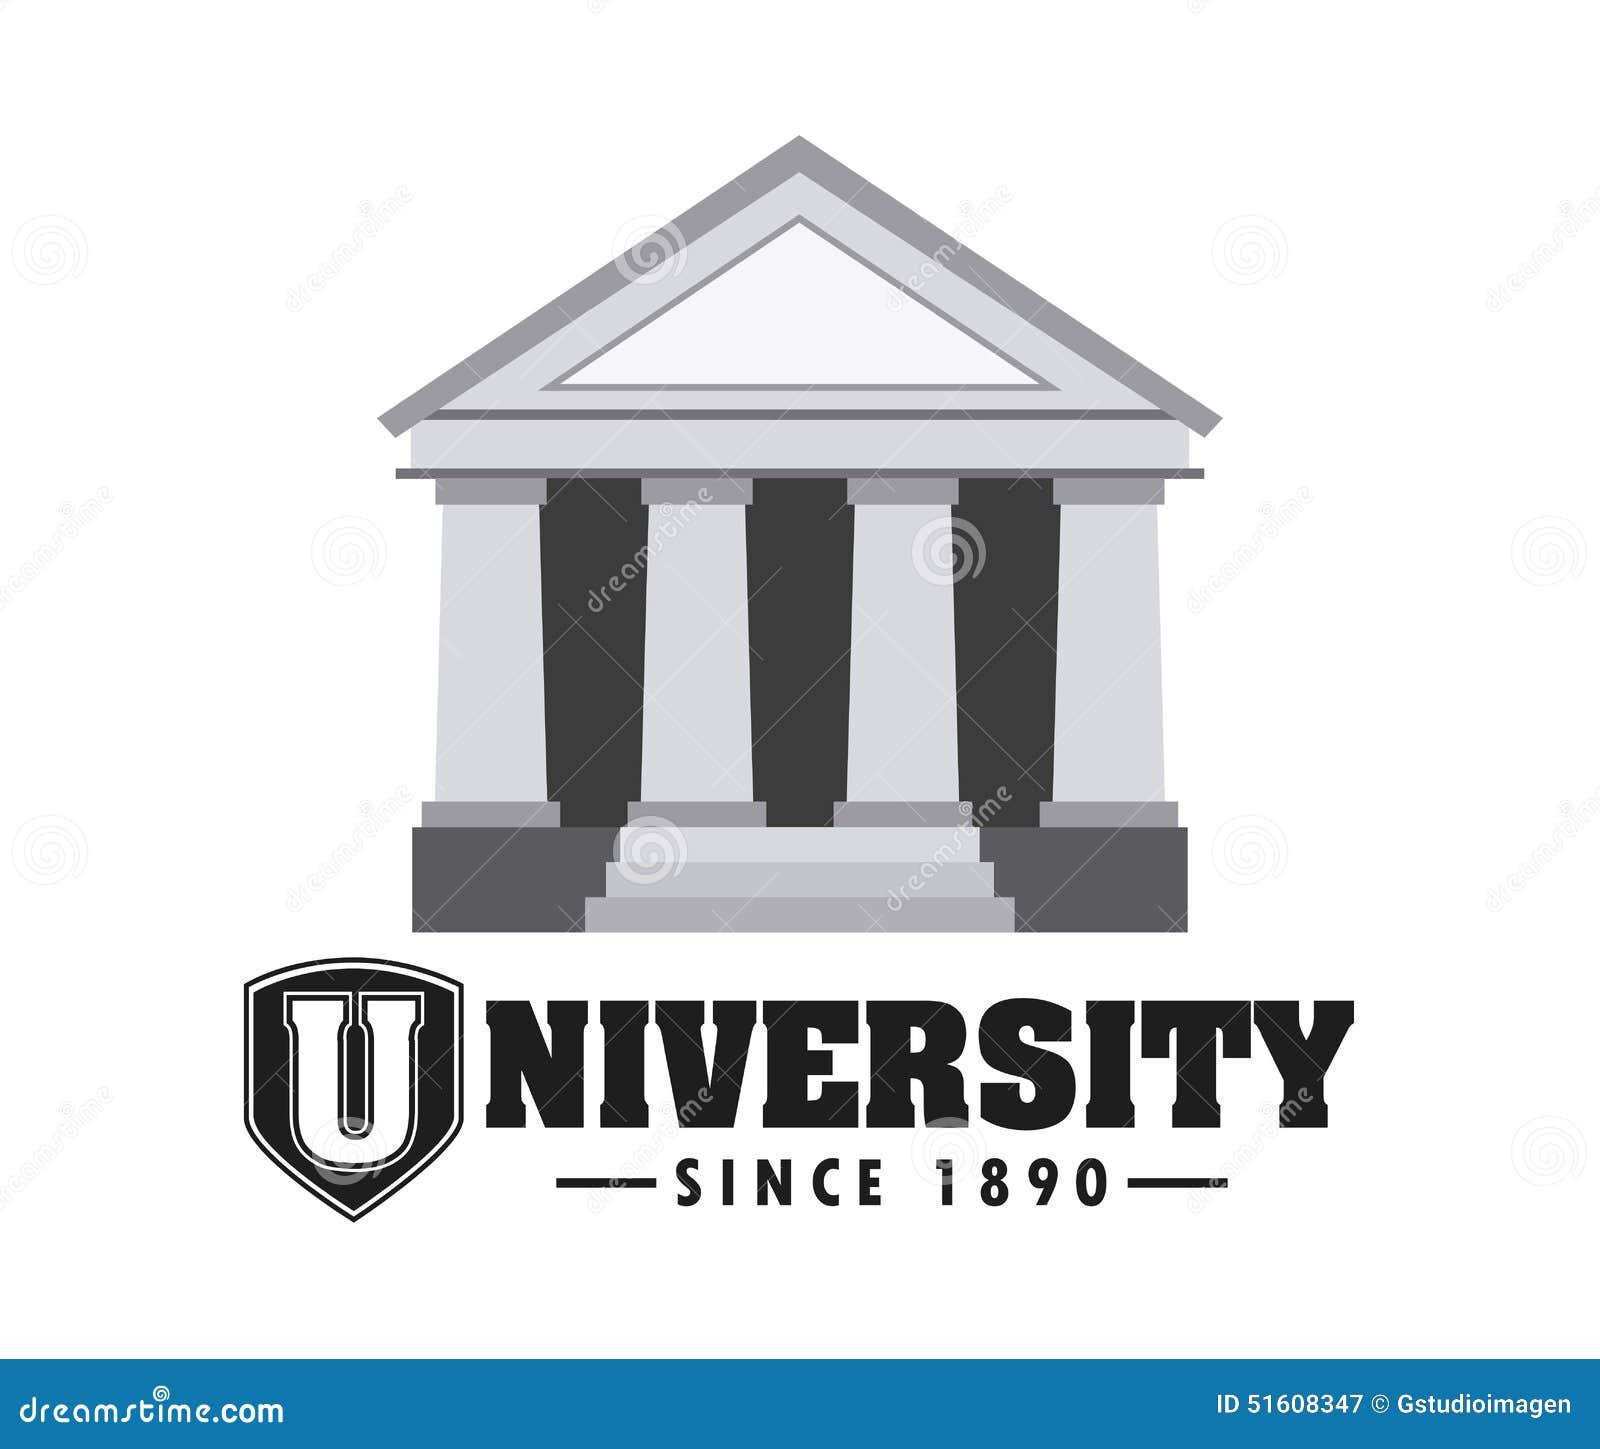 university campus clipart - photo #30